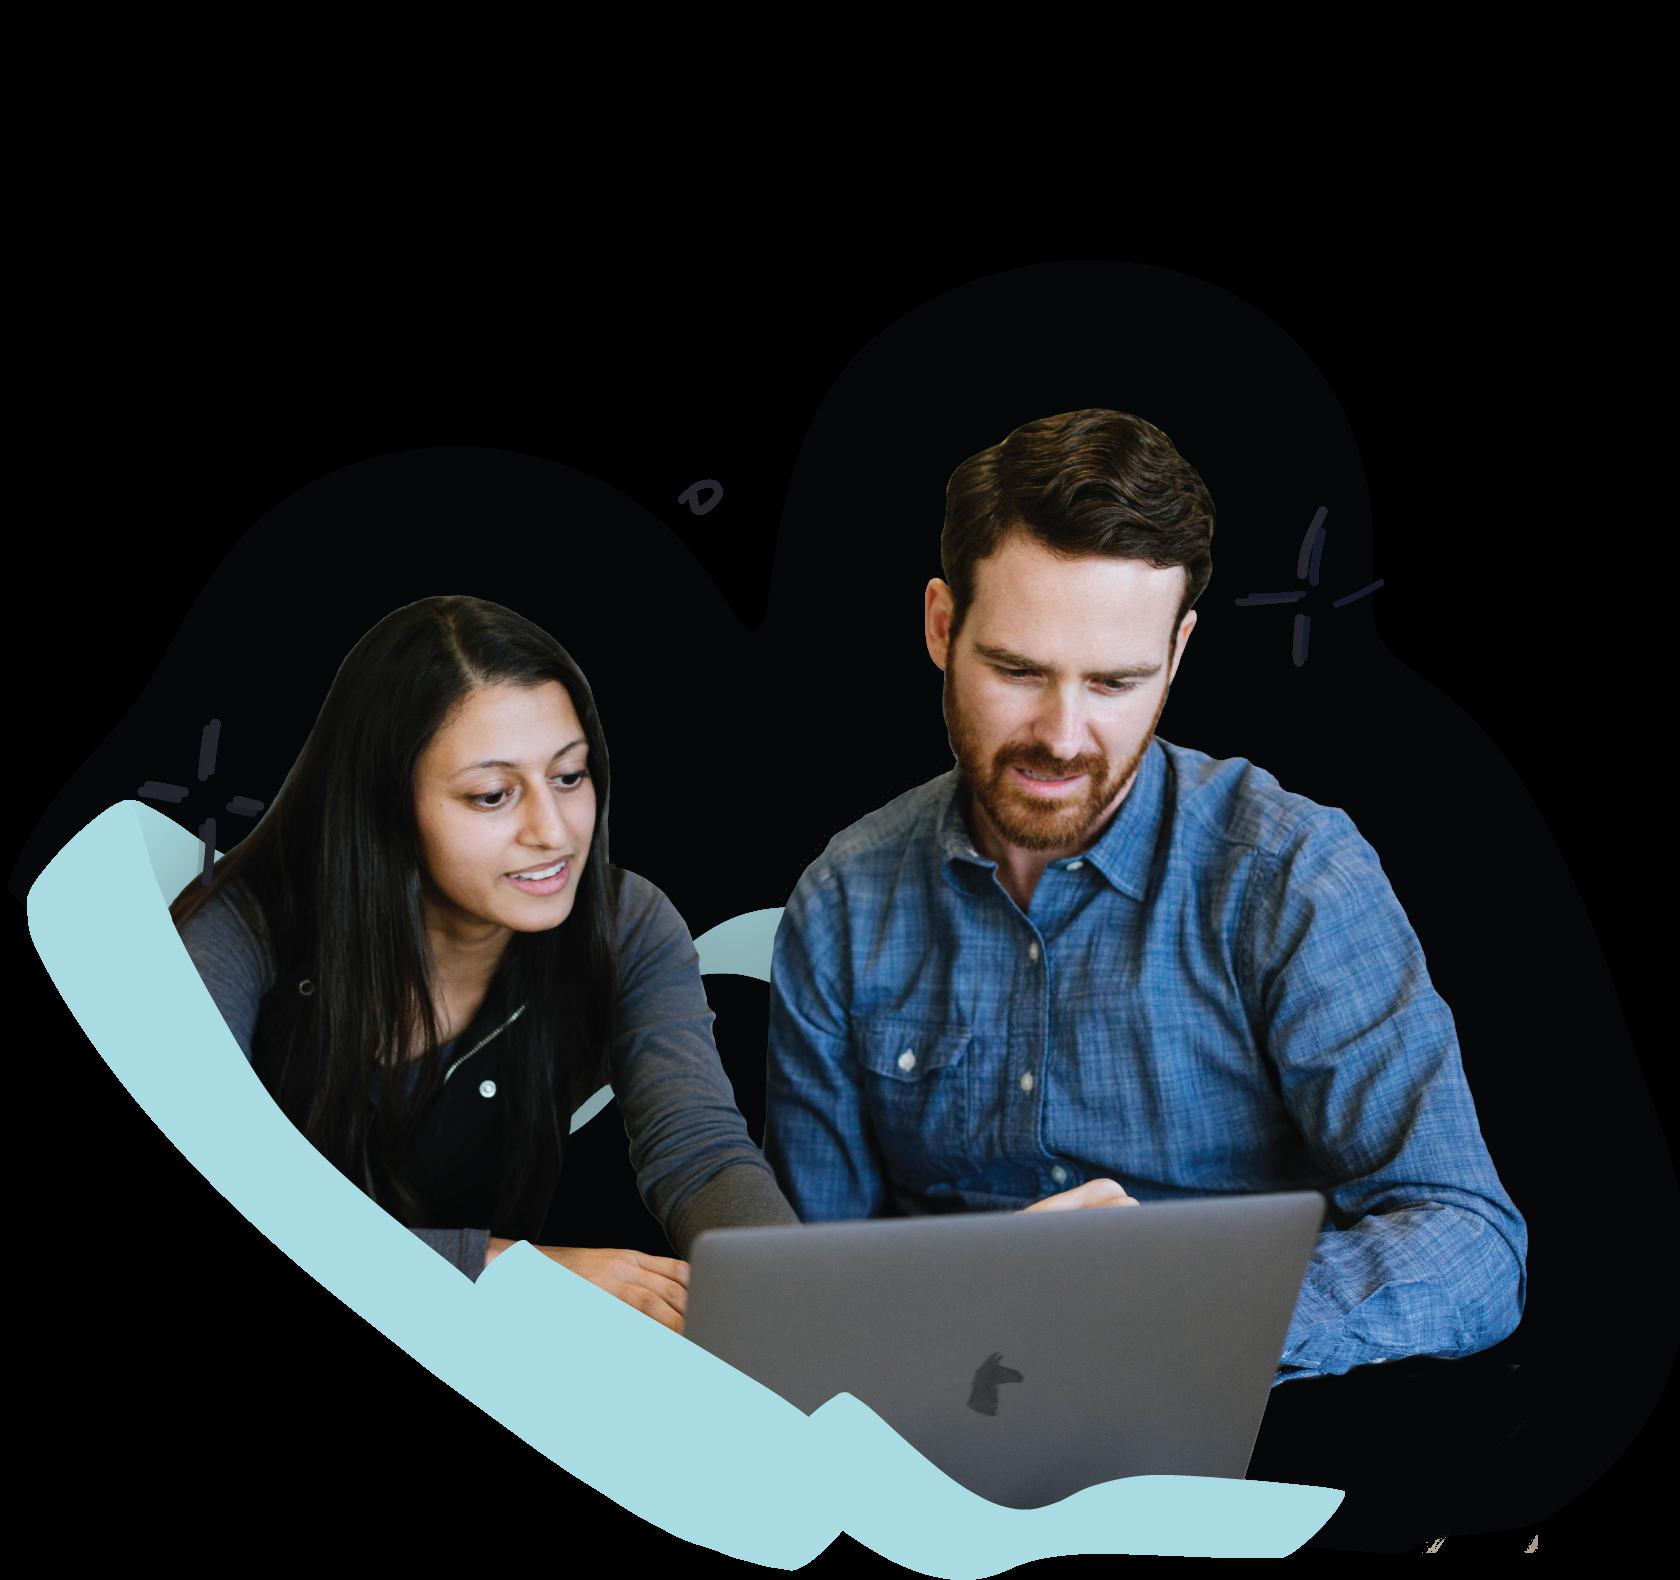 Teammates looking at a shared screen.